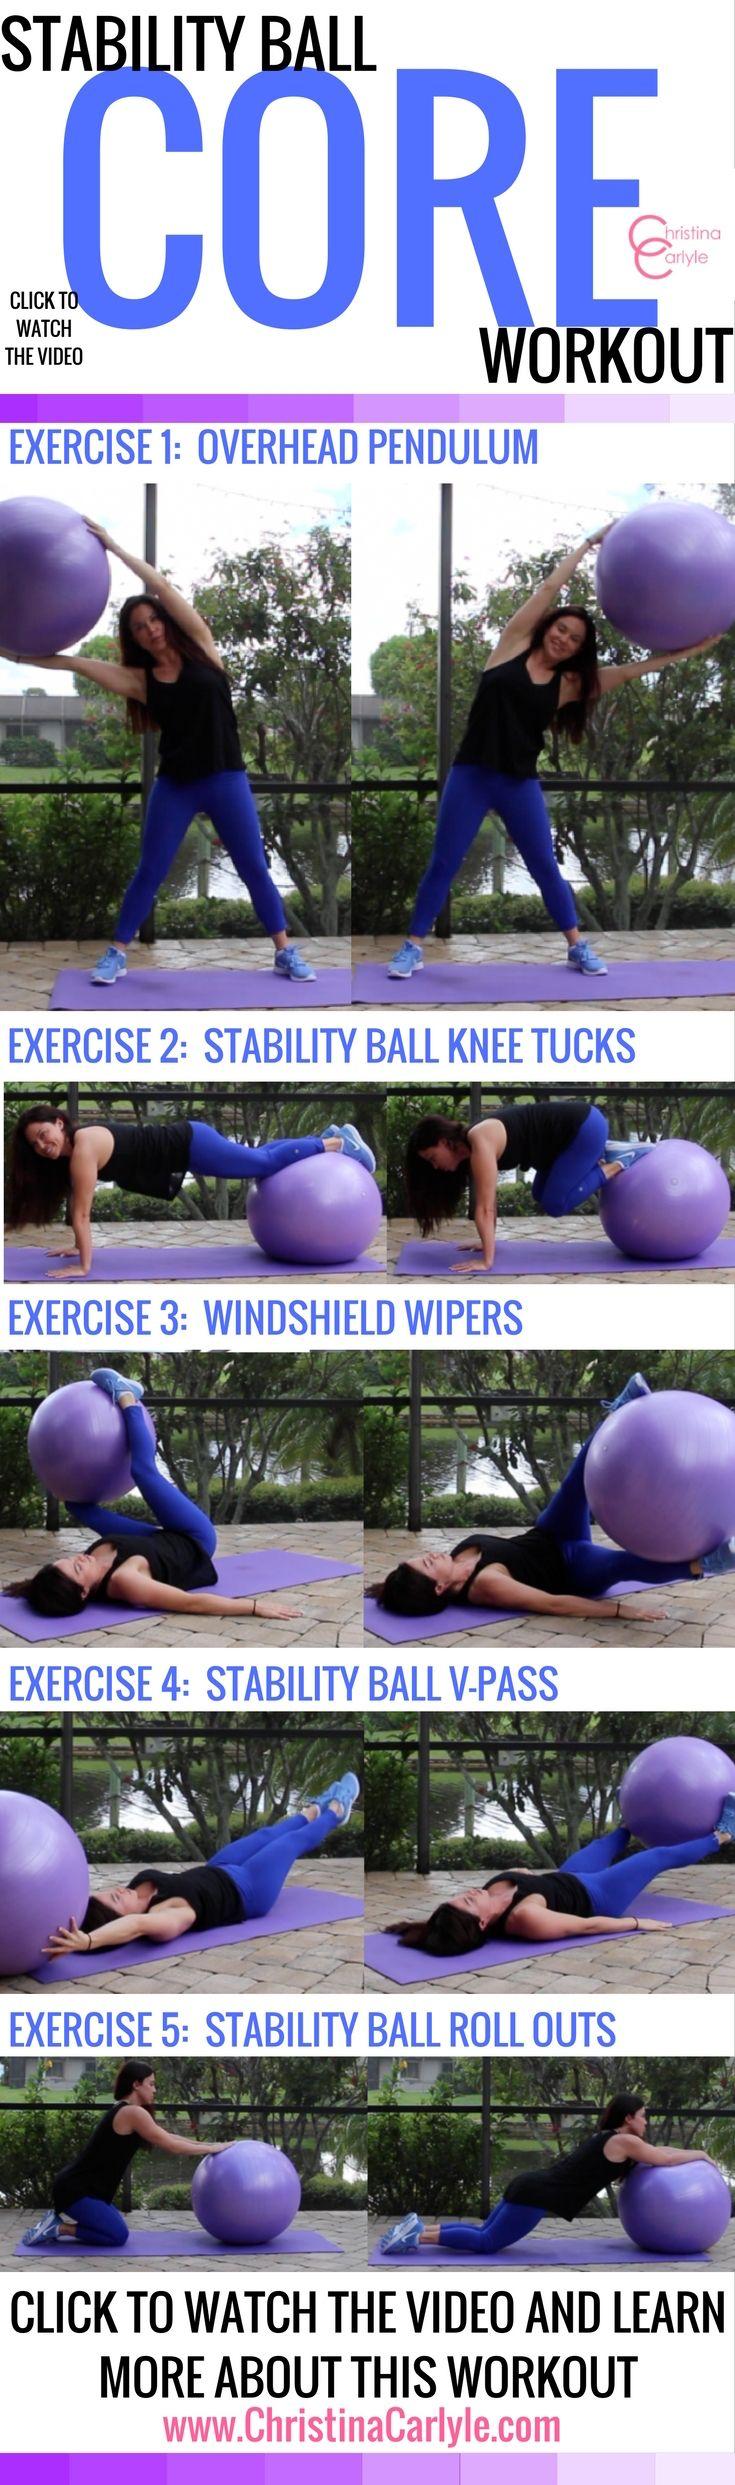 Stability Ball Core Workout